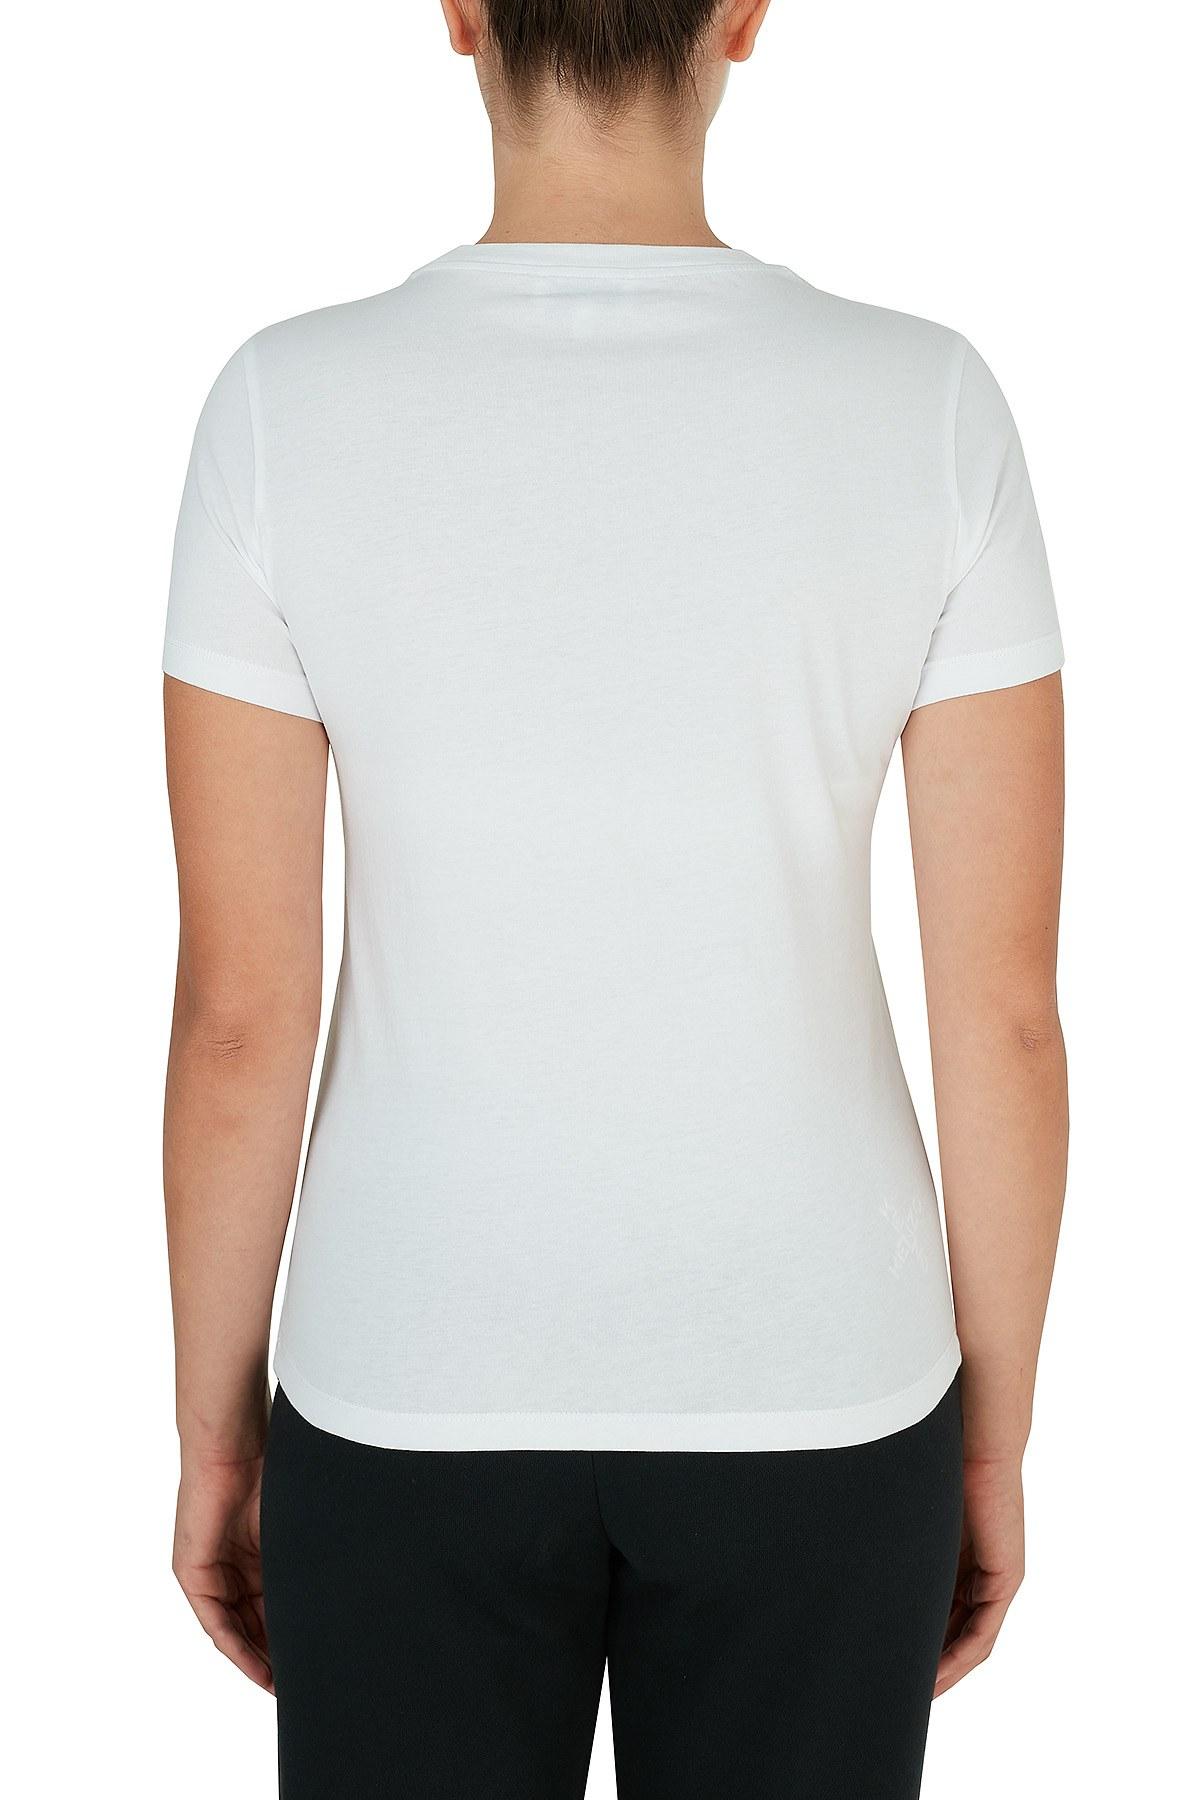 Kenzo Baskılı Bisiklet Yaka % 100 Pamuk Kadın T Shirt FA6 2TS846 4YB 01 BEYAZ